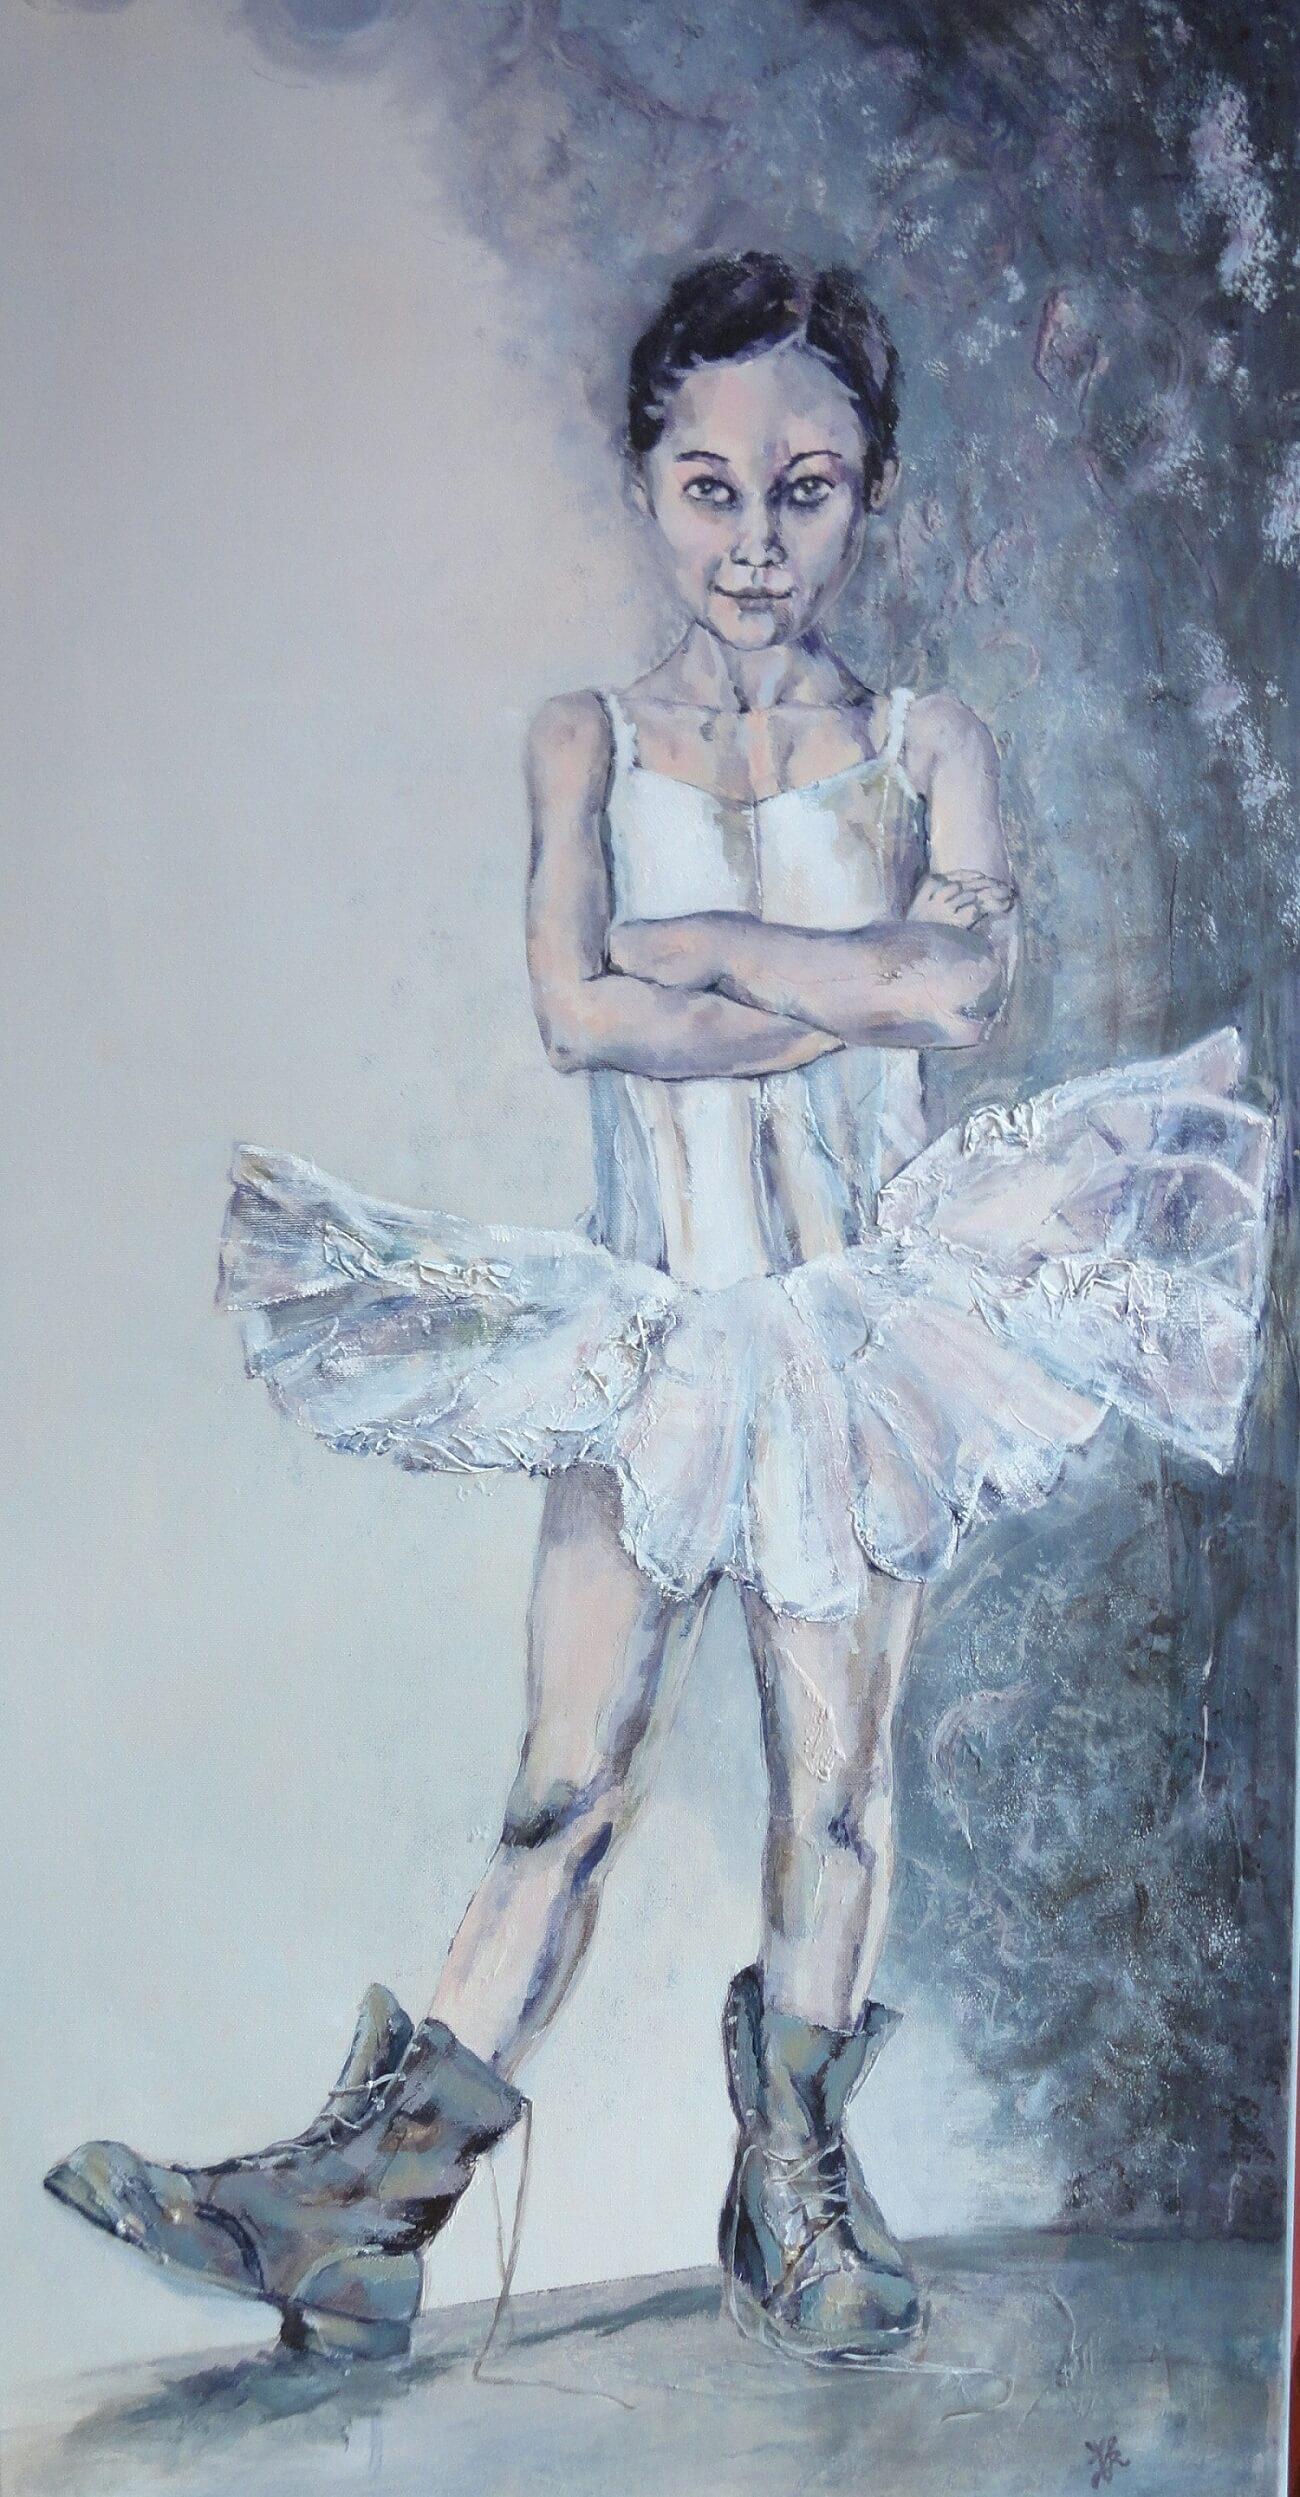 kristel_jacobs_ballerina_2012_100x50